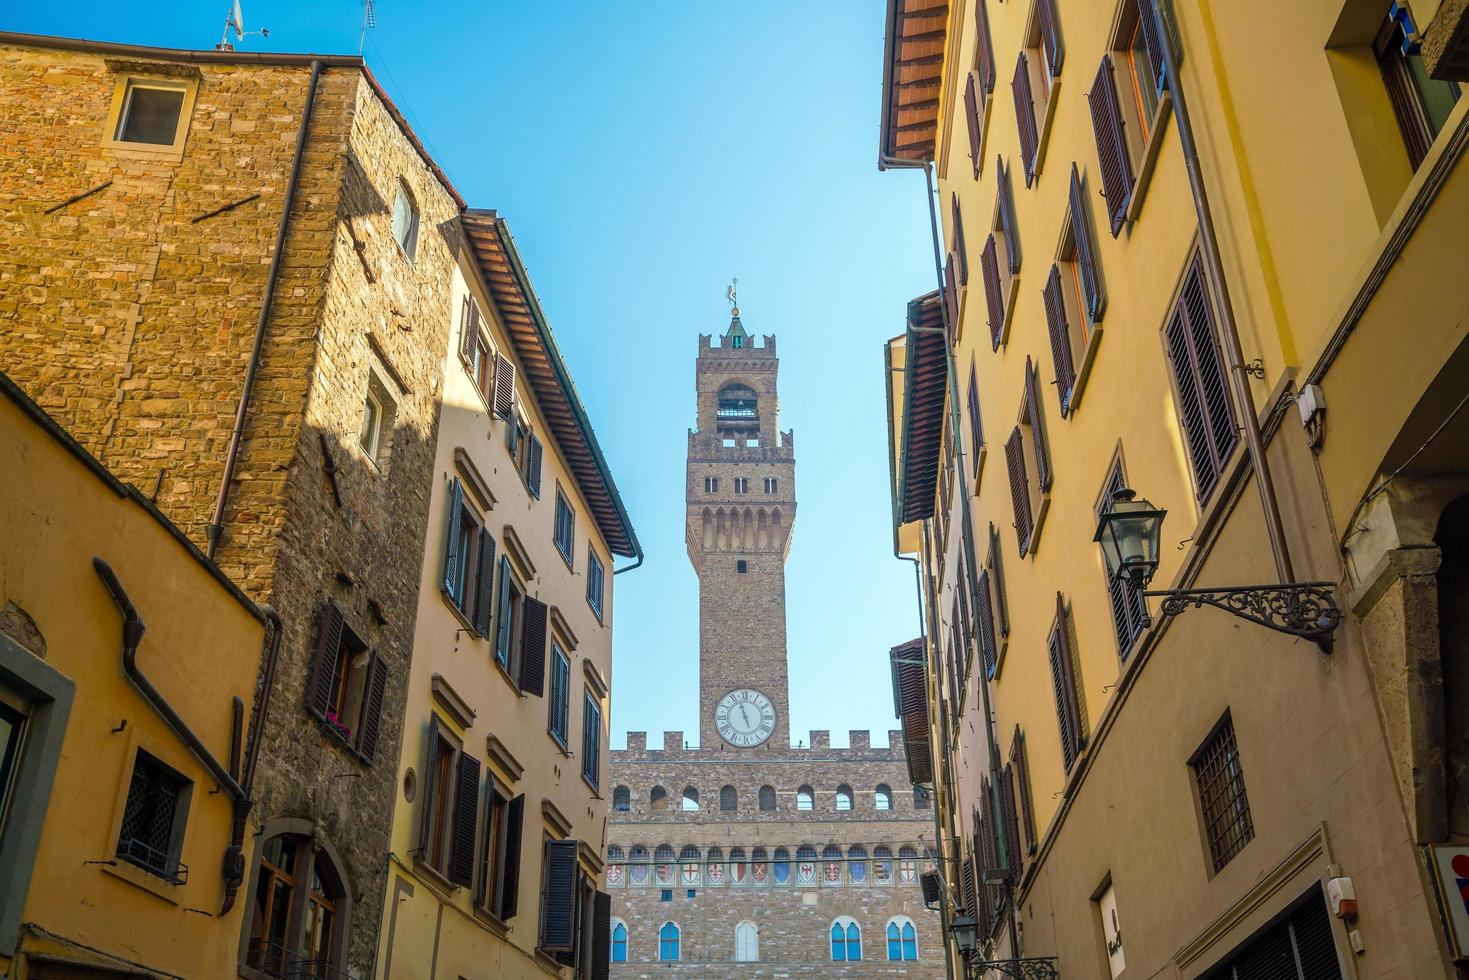 Palazzo vecchio en Florencia Italia foto